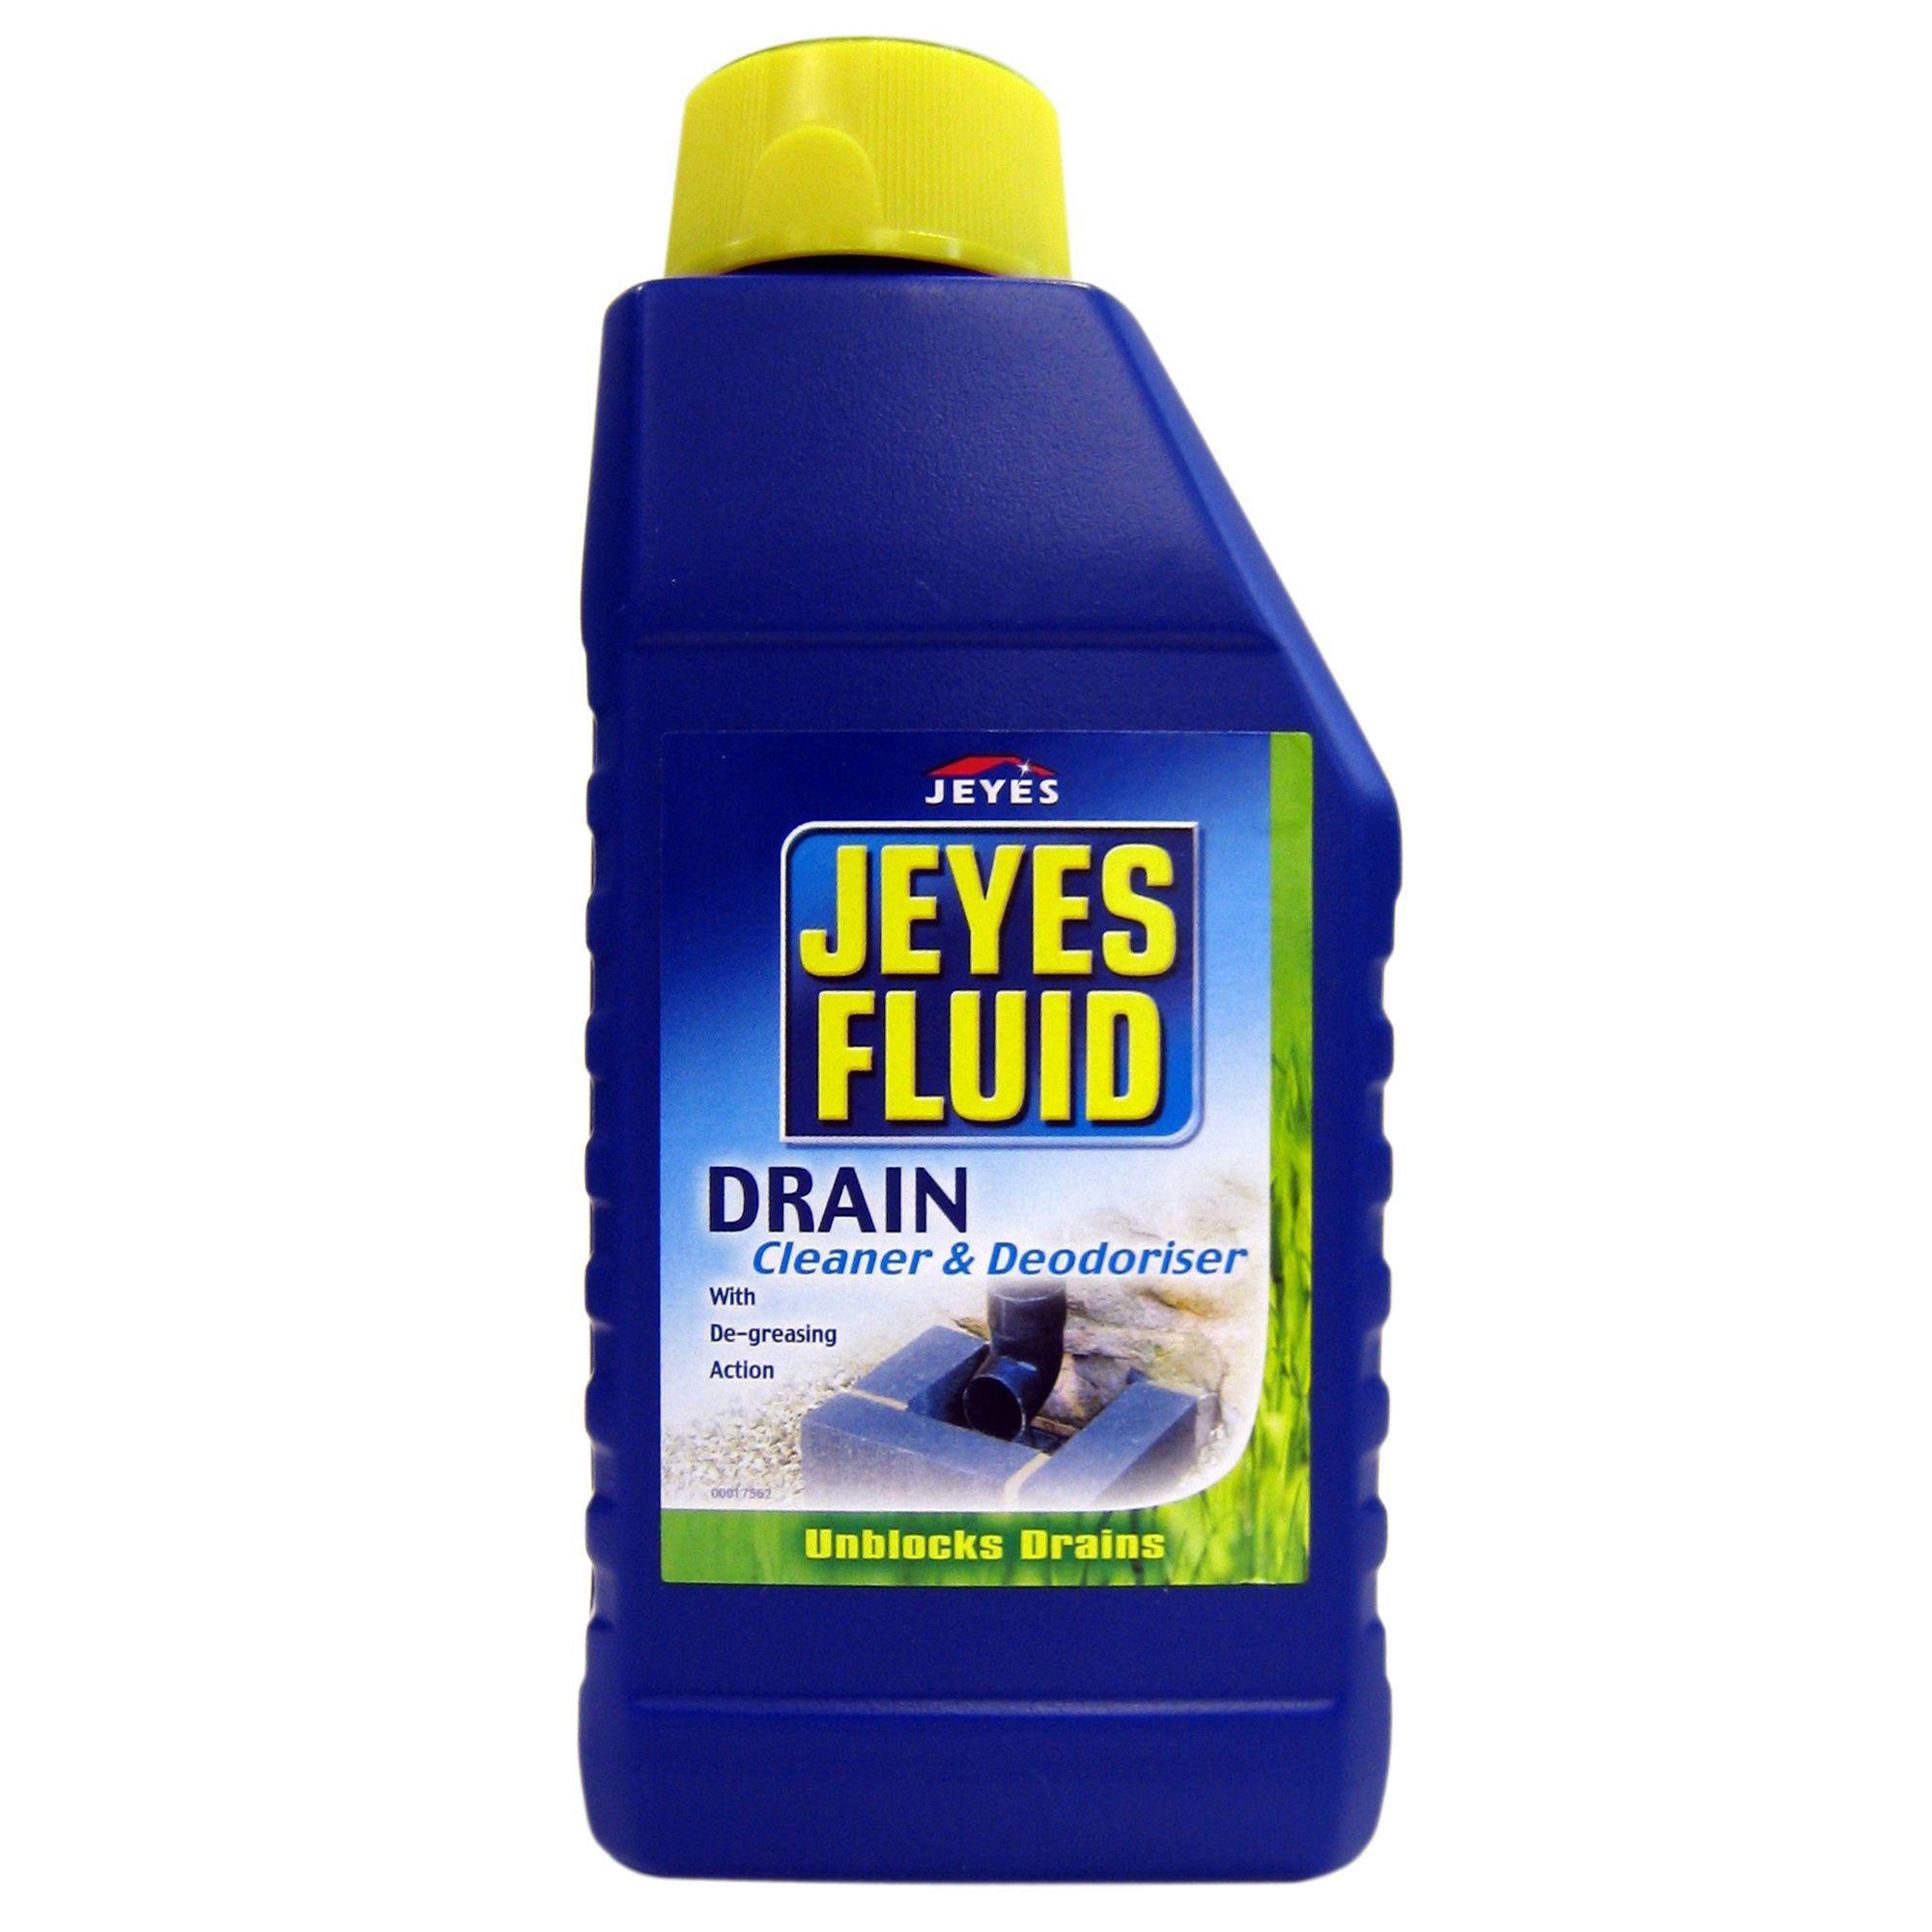 kitchen sinks with drain boards the orleans island jeyes fluid cleaner & unblocker bottle, 1000 ml ...